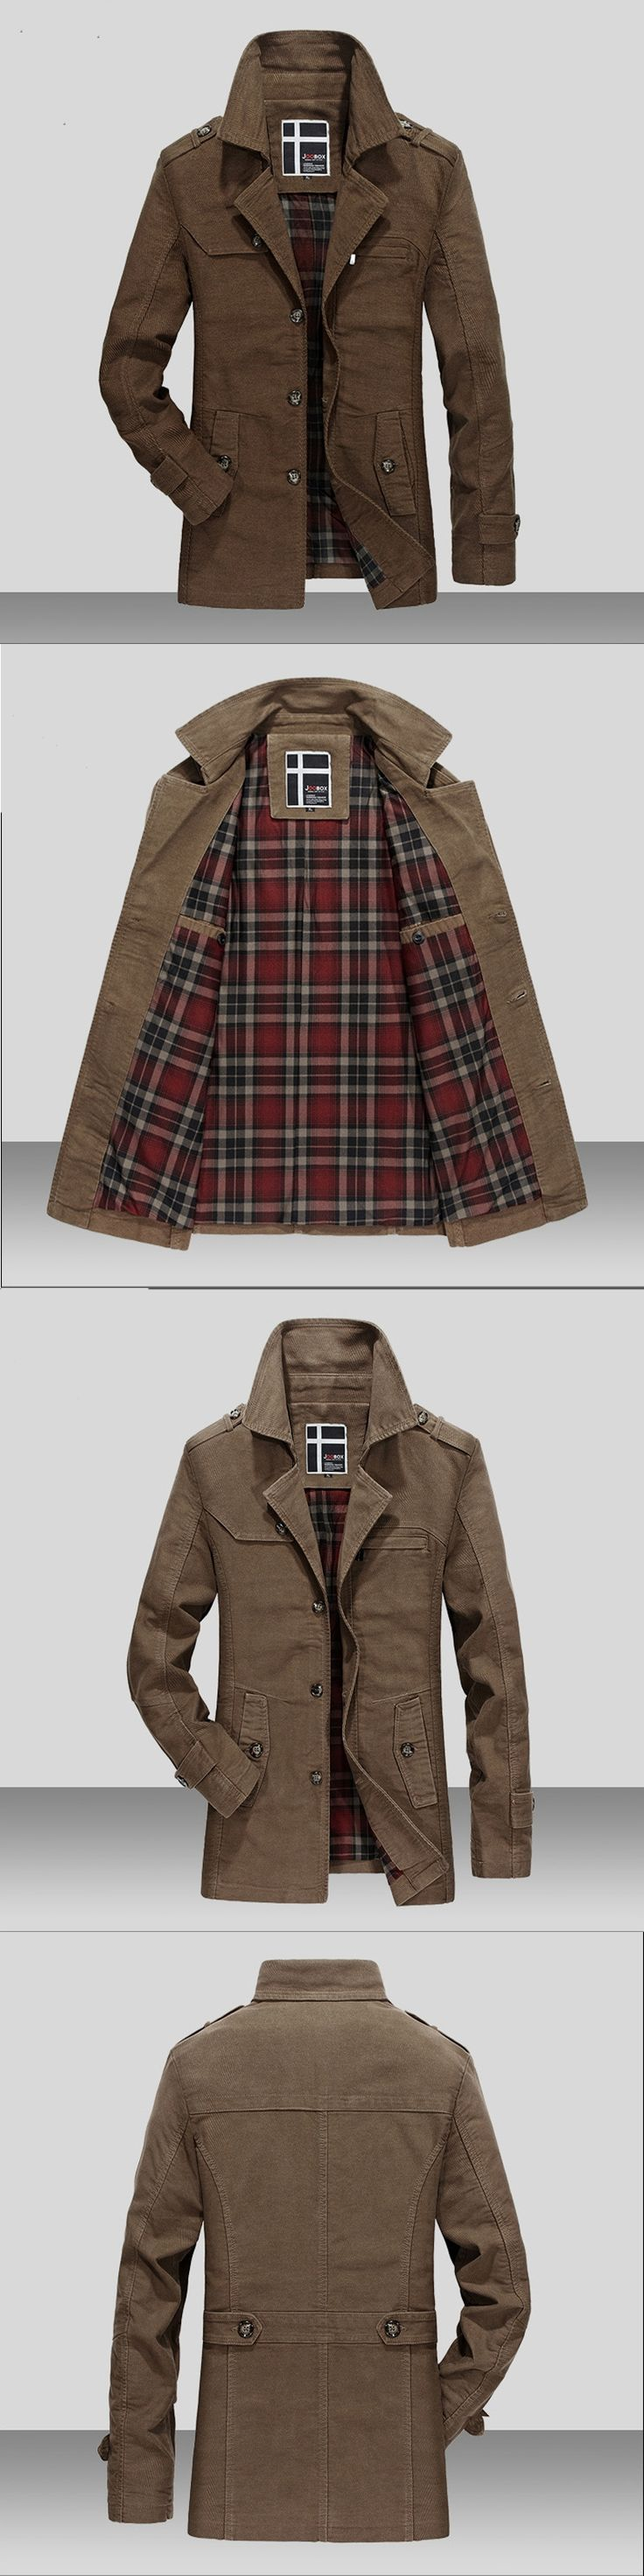 jackets men bape bomber jacket military leather jacket tactical rick and morty cortavientos veste homme ma1 bomber jacket m65 55